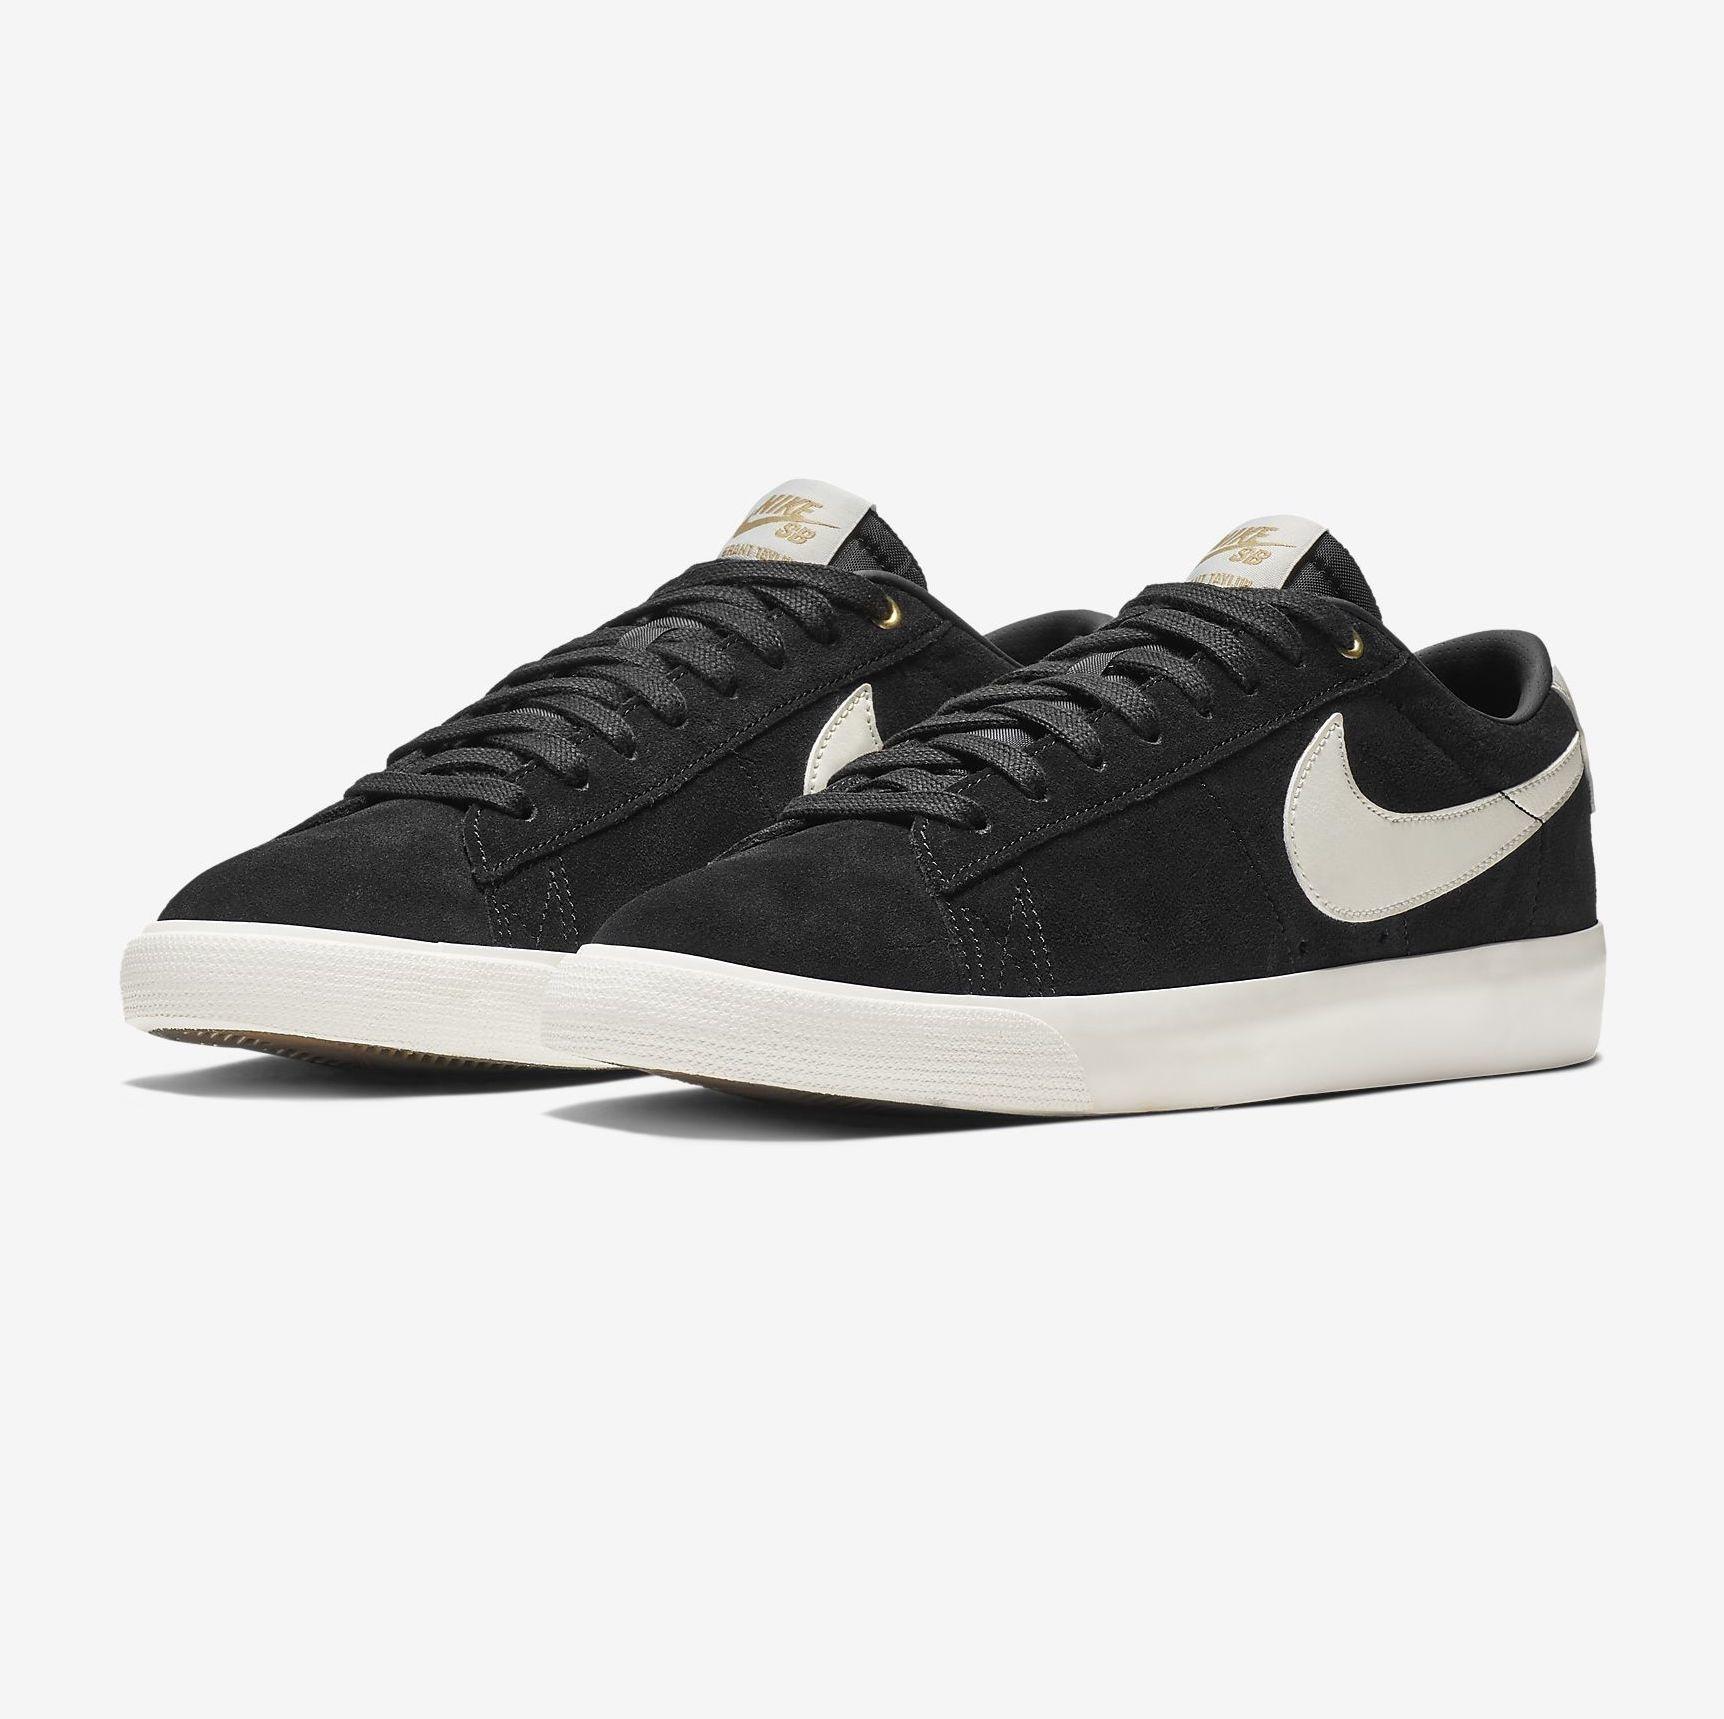 Nike USA, Inc. Nike SB Zoom Blazer Low GT Black/Sail